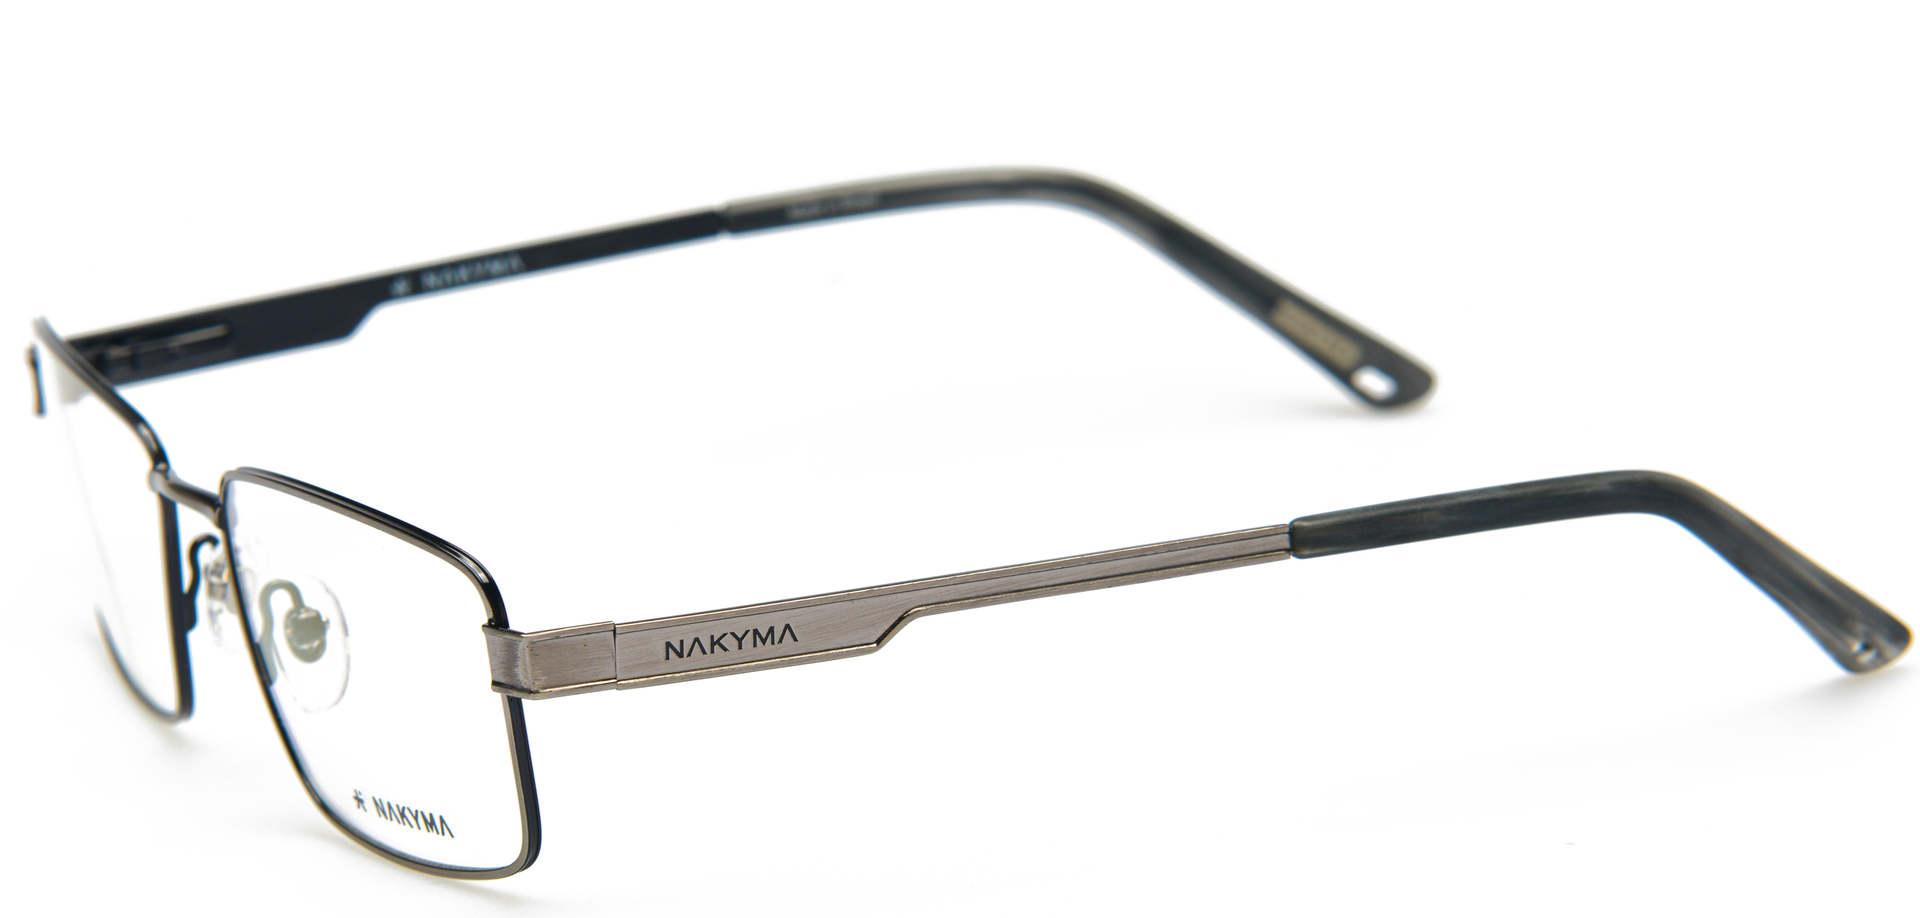 8R1-NAKYMA-06-C2